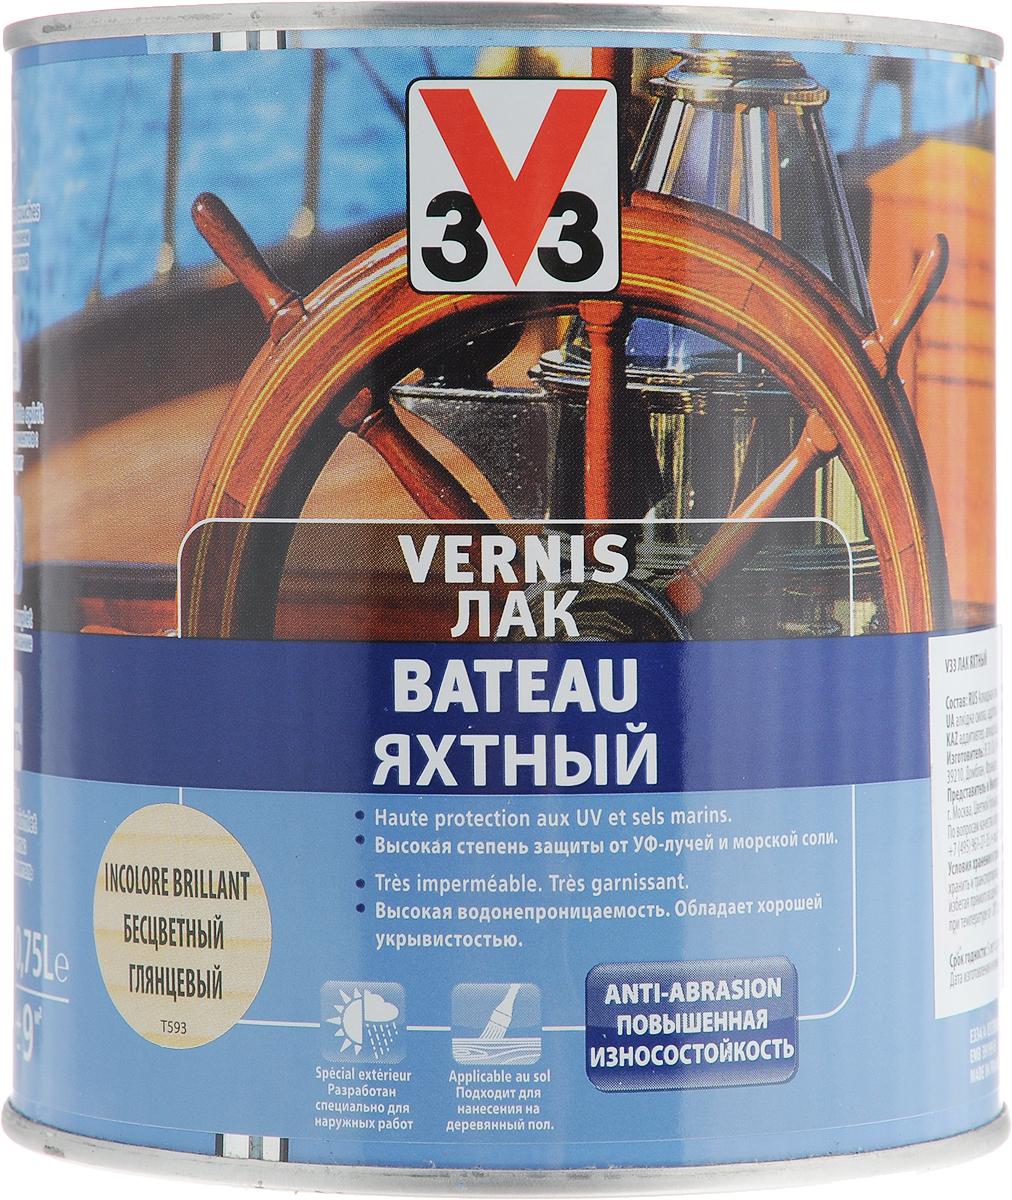 Лак яхтный V33, глянцевый, цвет: прозрачный, 0,75 л лак яхтный рогнеда eurotex полуматовый 10л